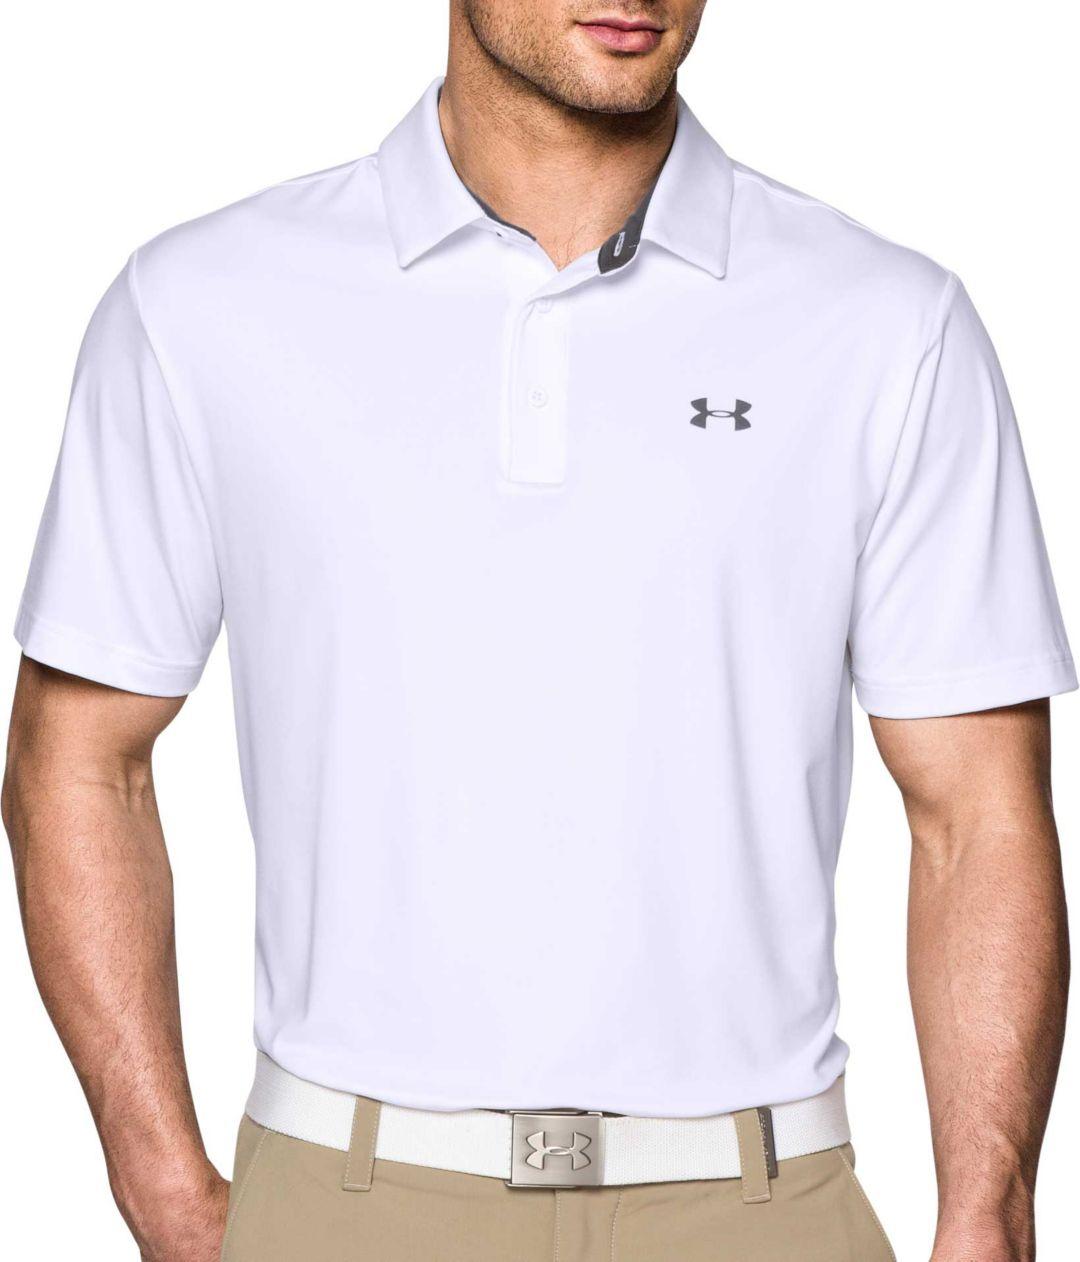 c20ebf11 Under Armour Men's Playoff Golf Polo - Big & Tall. noImageFound. Previous